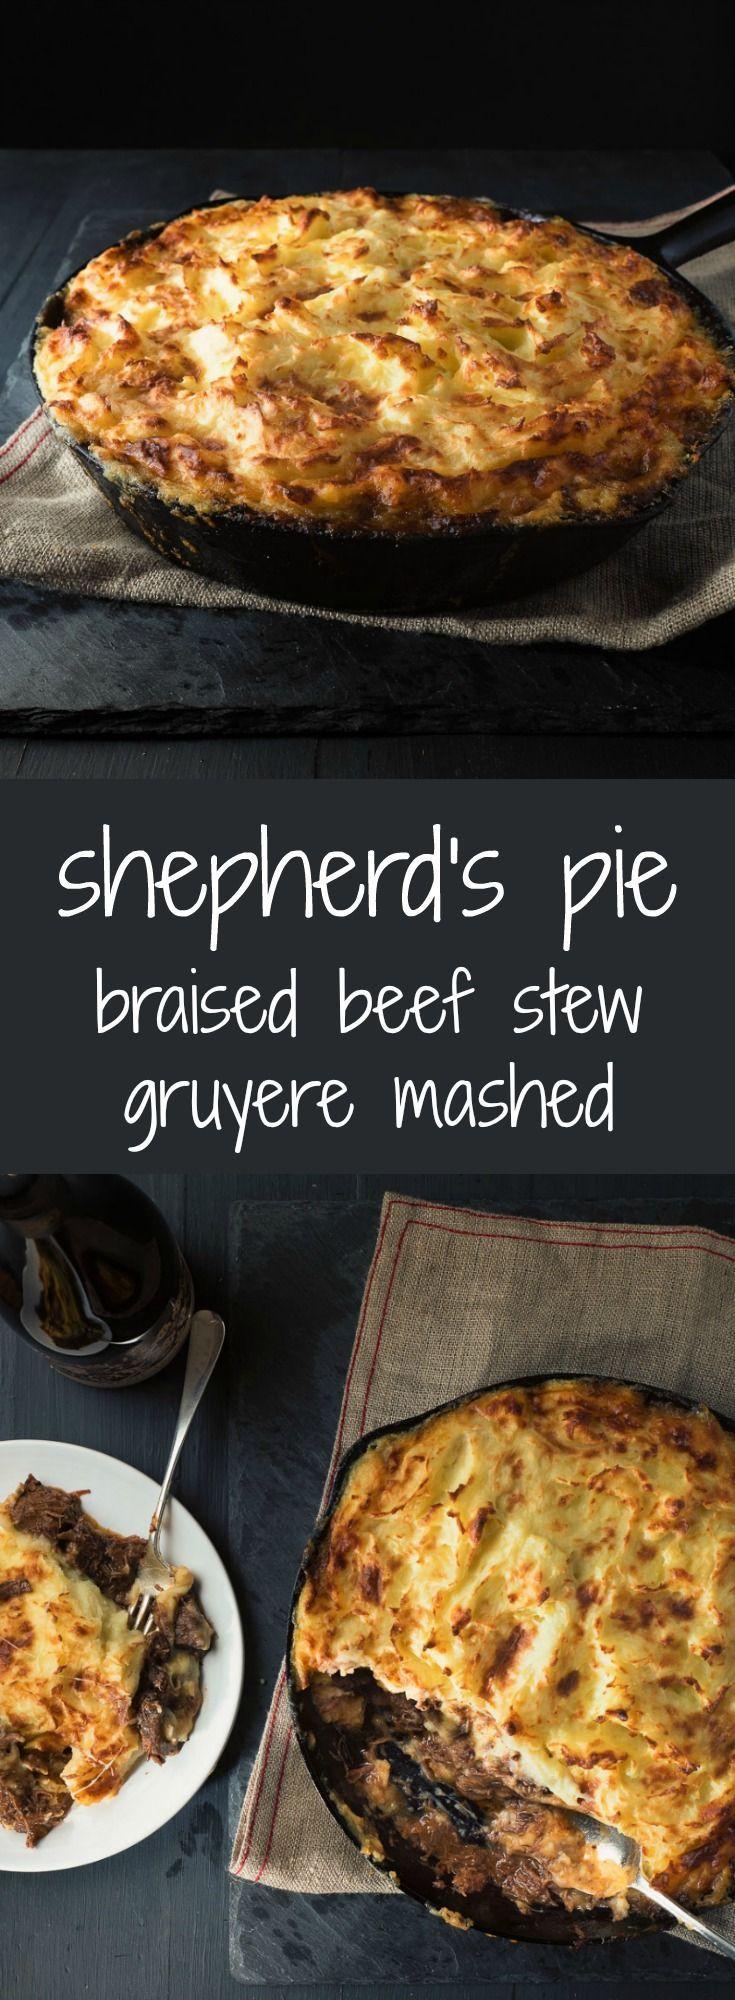 Hachis parmentier elevates shepherd's pie into something wonderful.